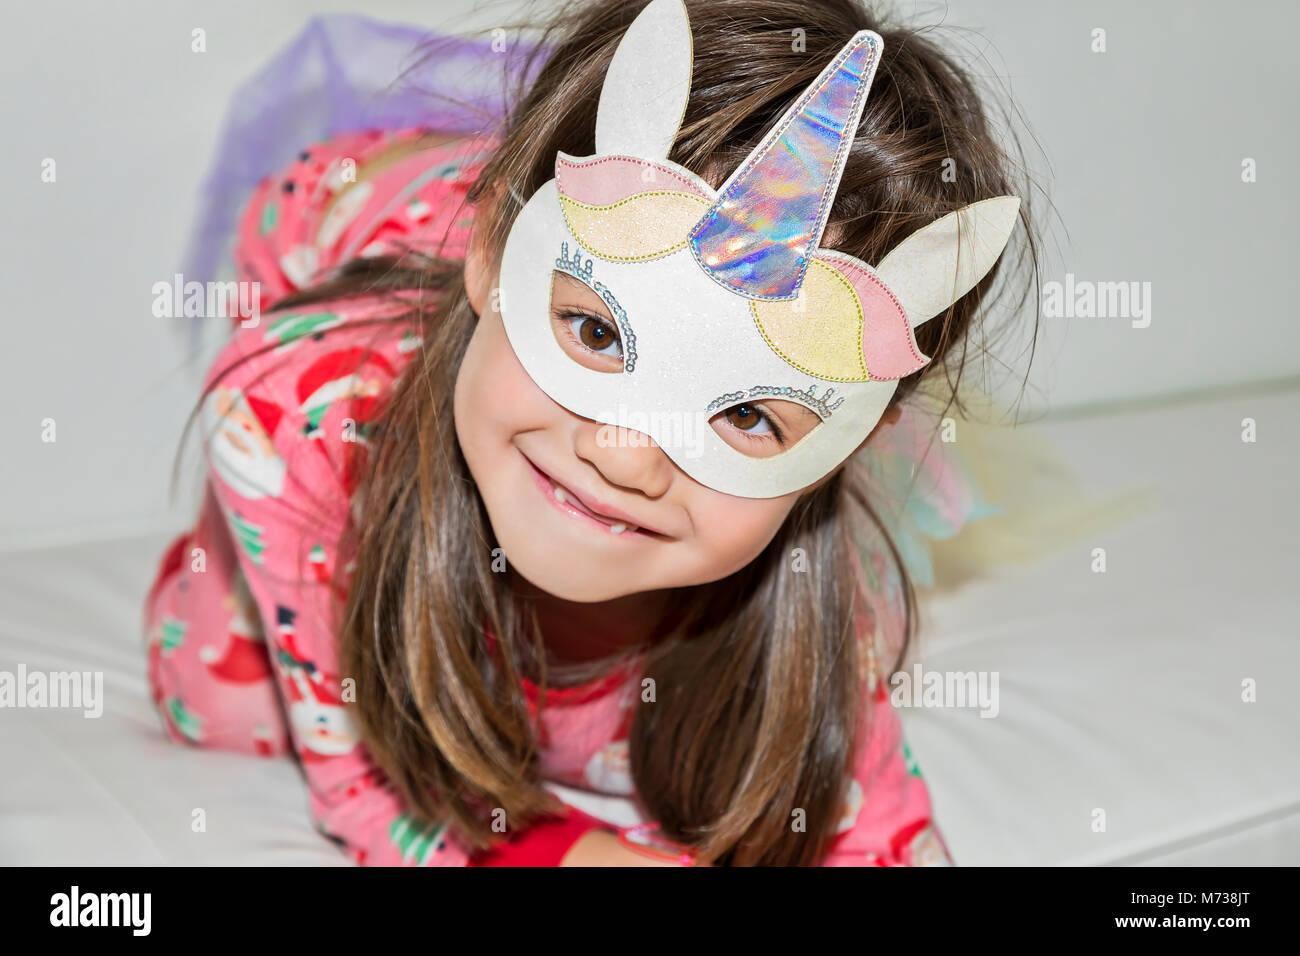 A six year old girl wearing a unicorn costume Stock Photo